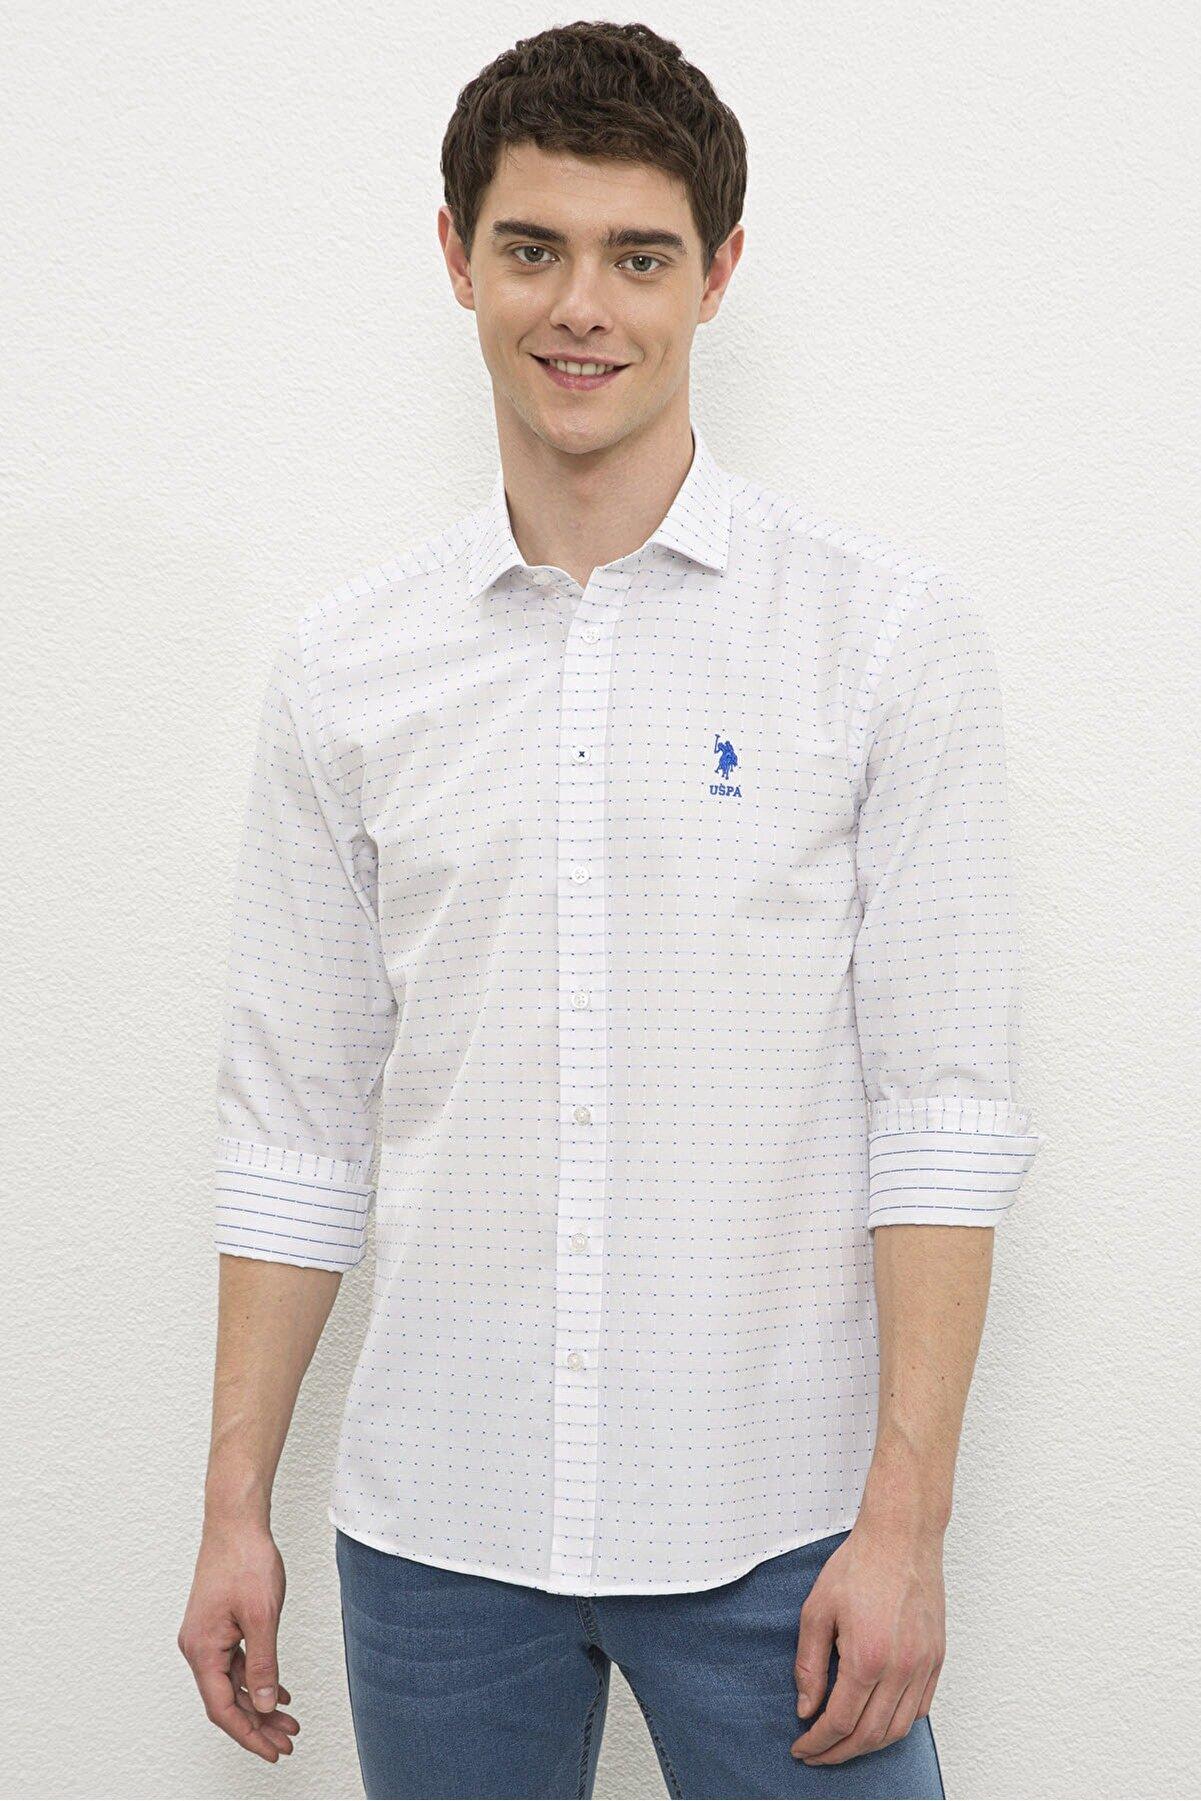 US Polo Assn Beyaz Erkek Gömlek G081Sz004.000.1180207